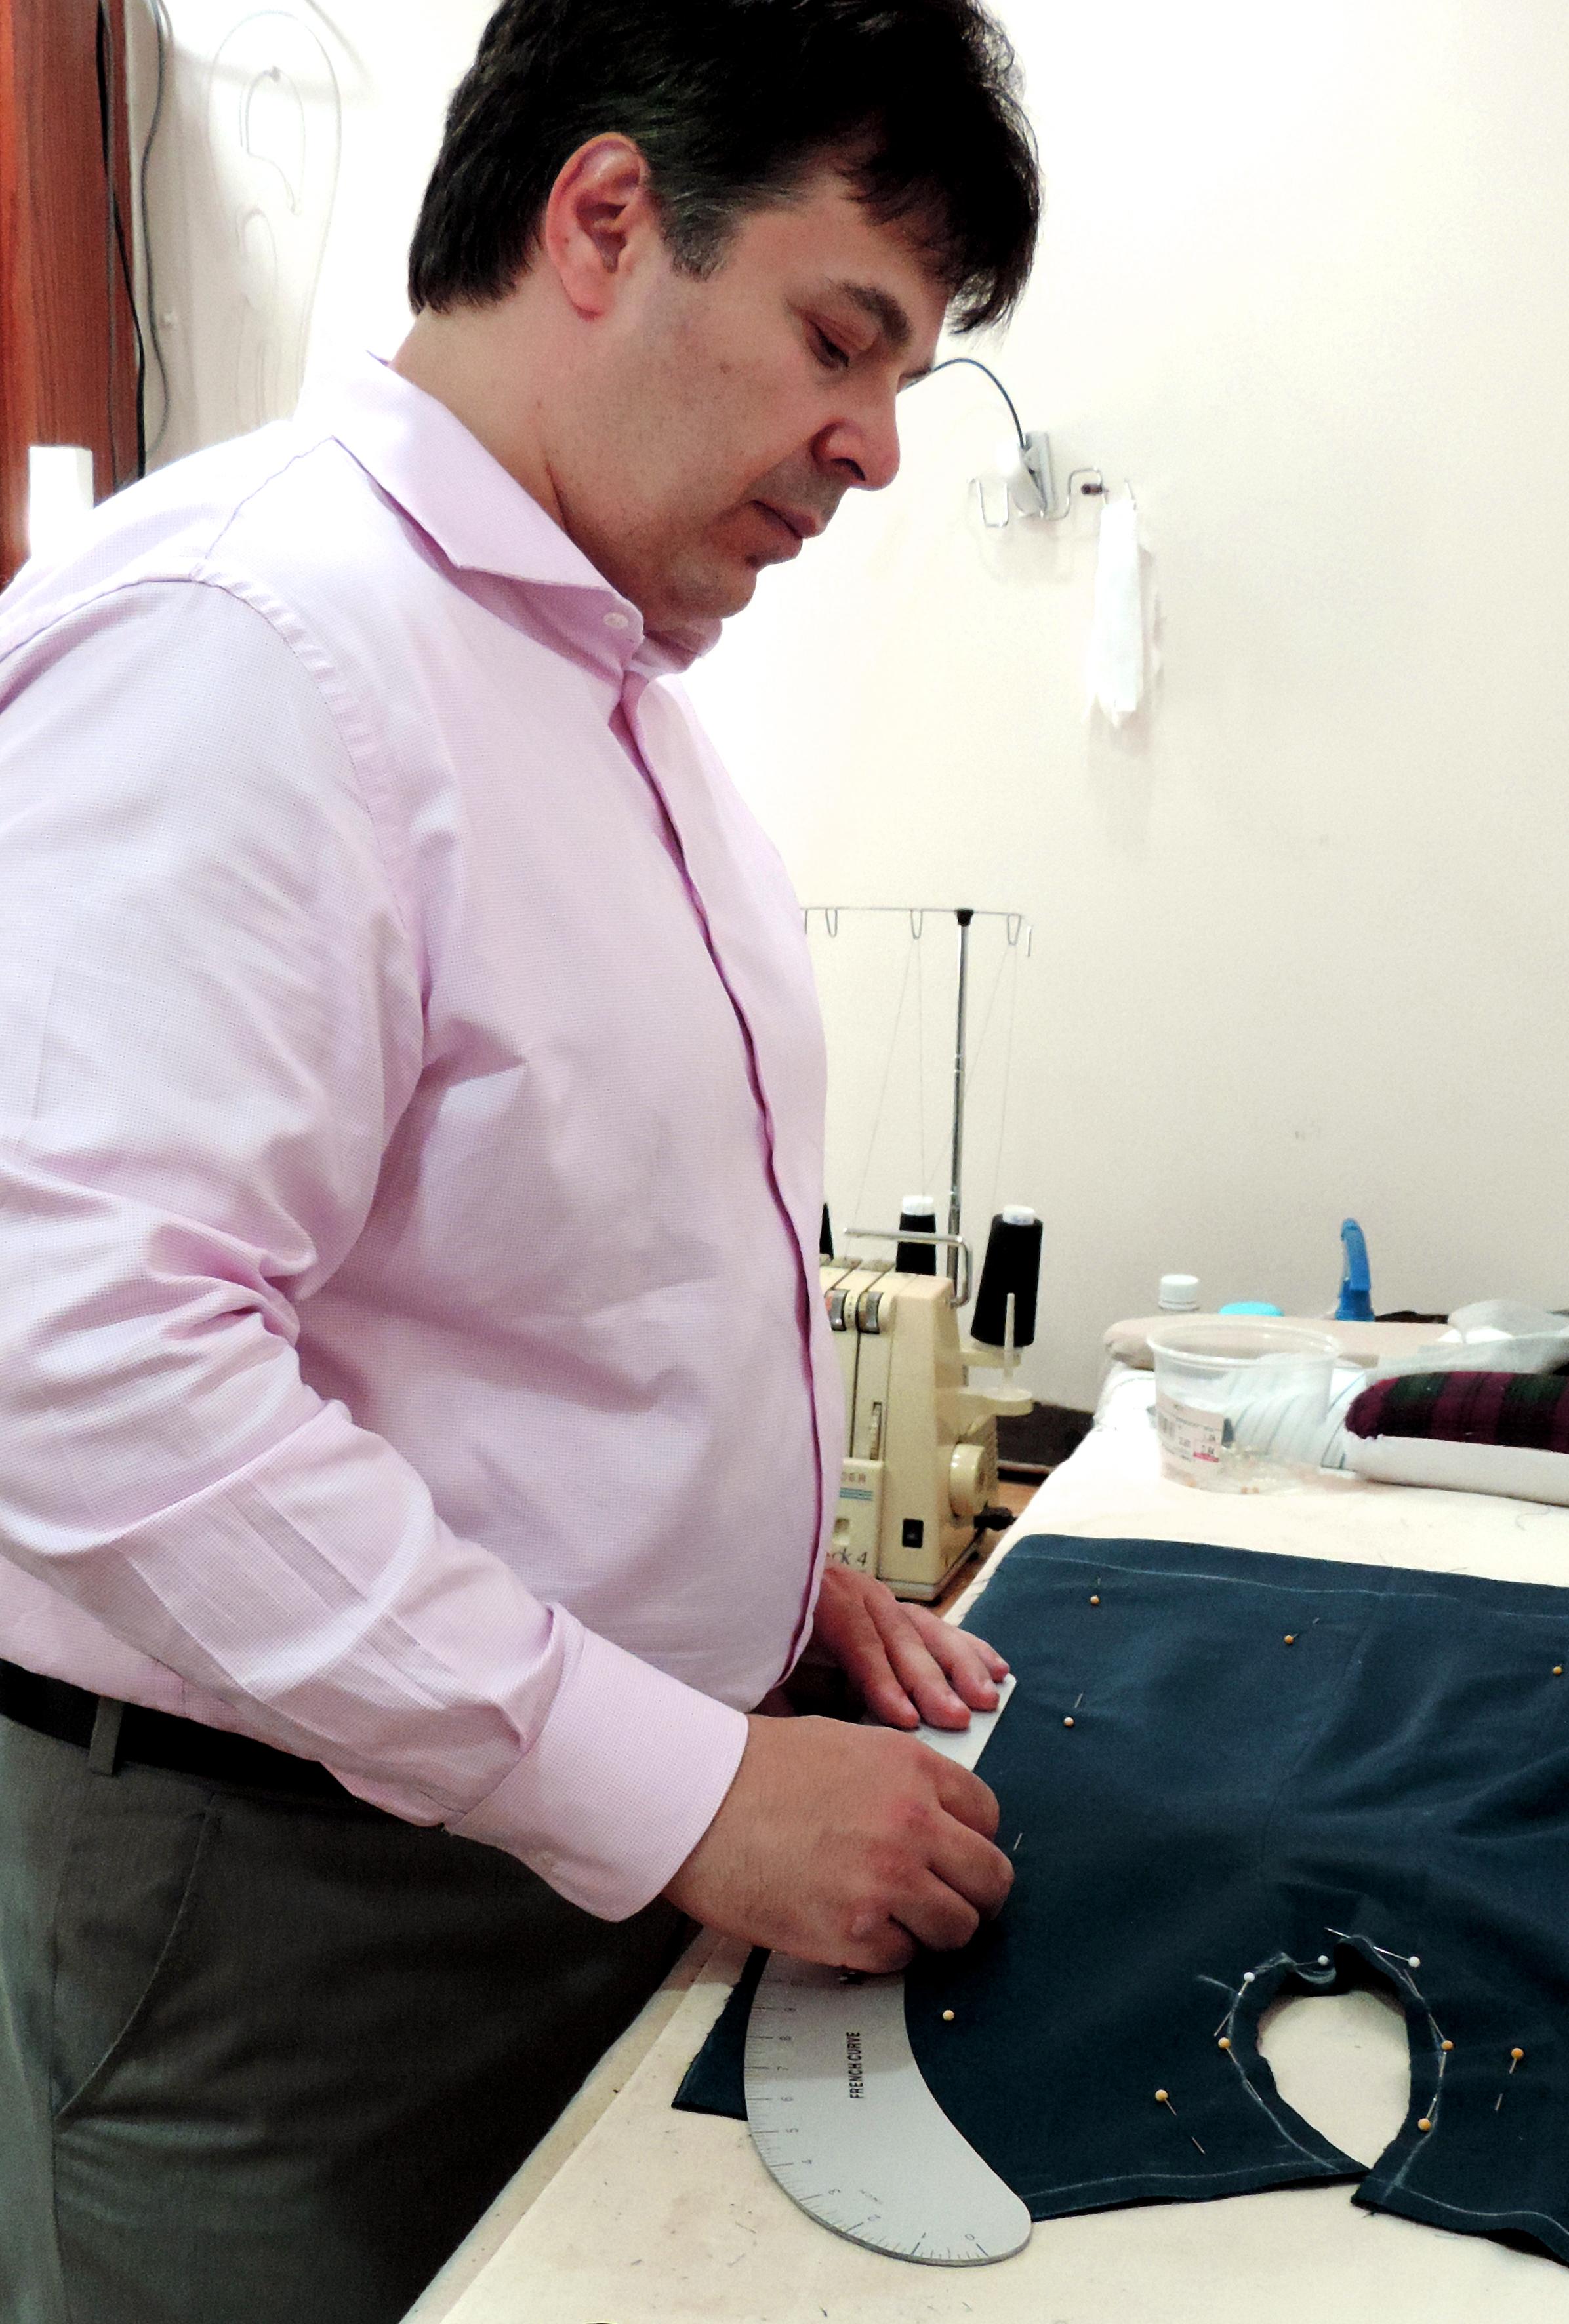 bespoke tailor